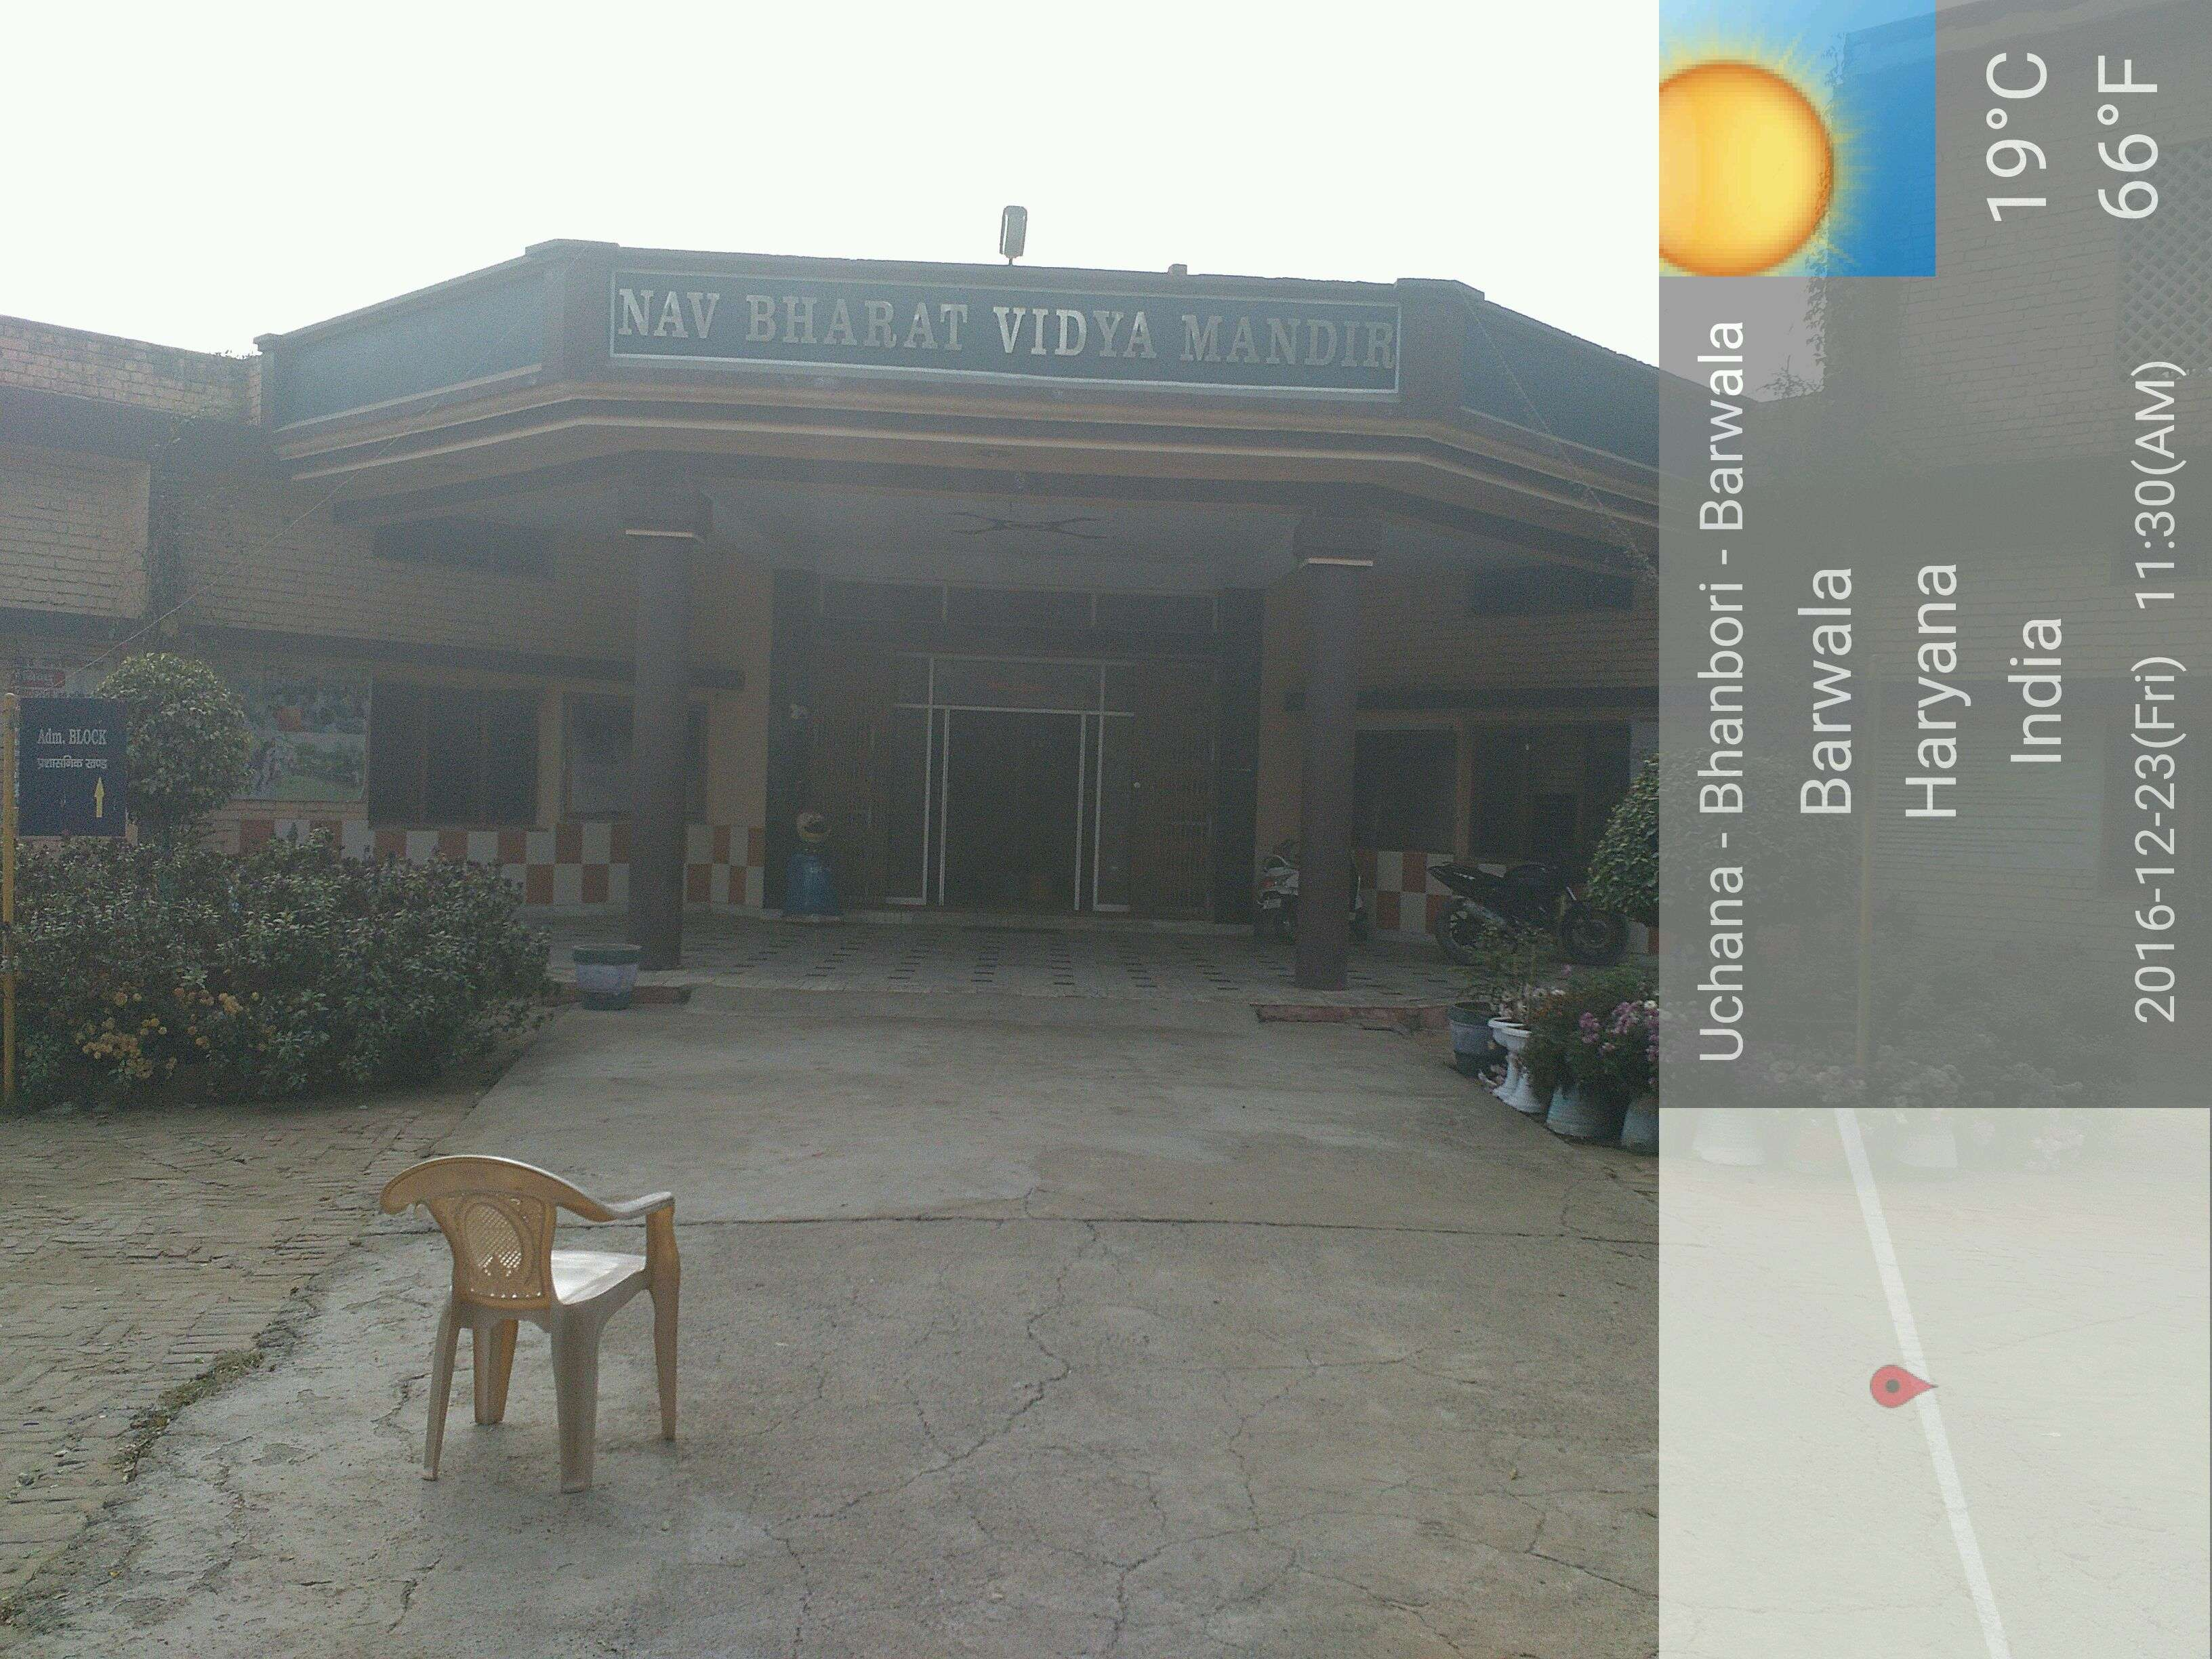 NAV BHARAT VIDYA MANDIR Nav Bharat Vidya MandirBarwala Hissar 530764